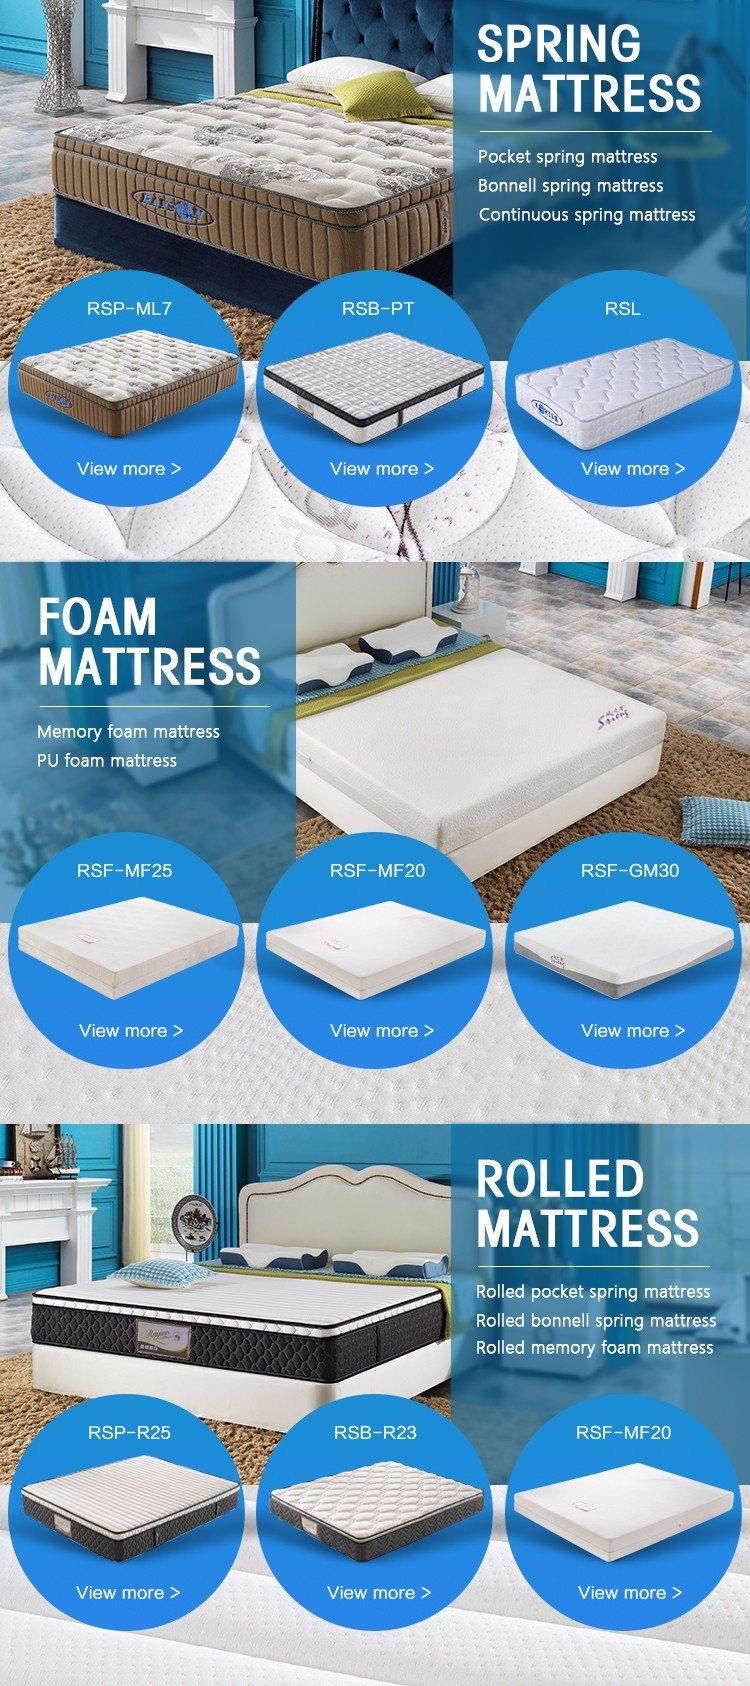 Rayson Mattress high quality who makes marriott mattress manufacturers-9